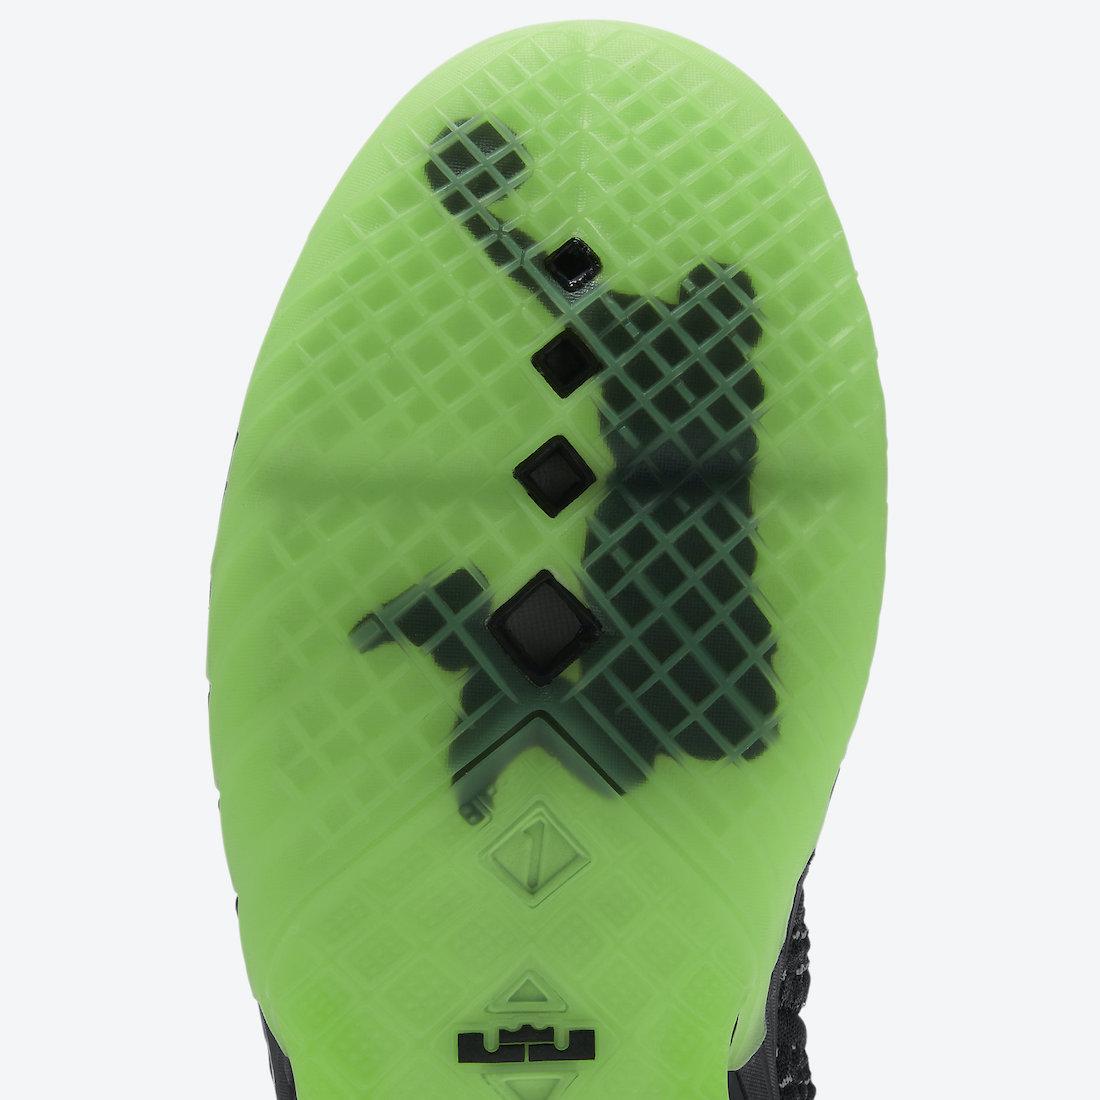 Nike-LeBron-18-Dunkman-CQ9284-005-Release-Date-8